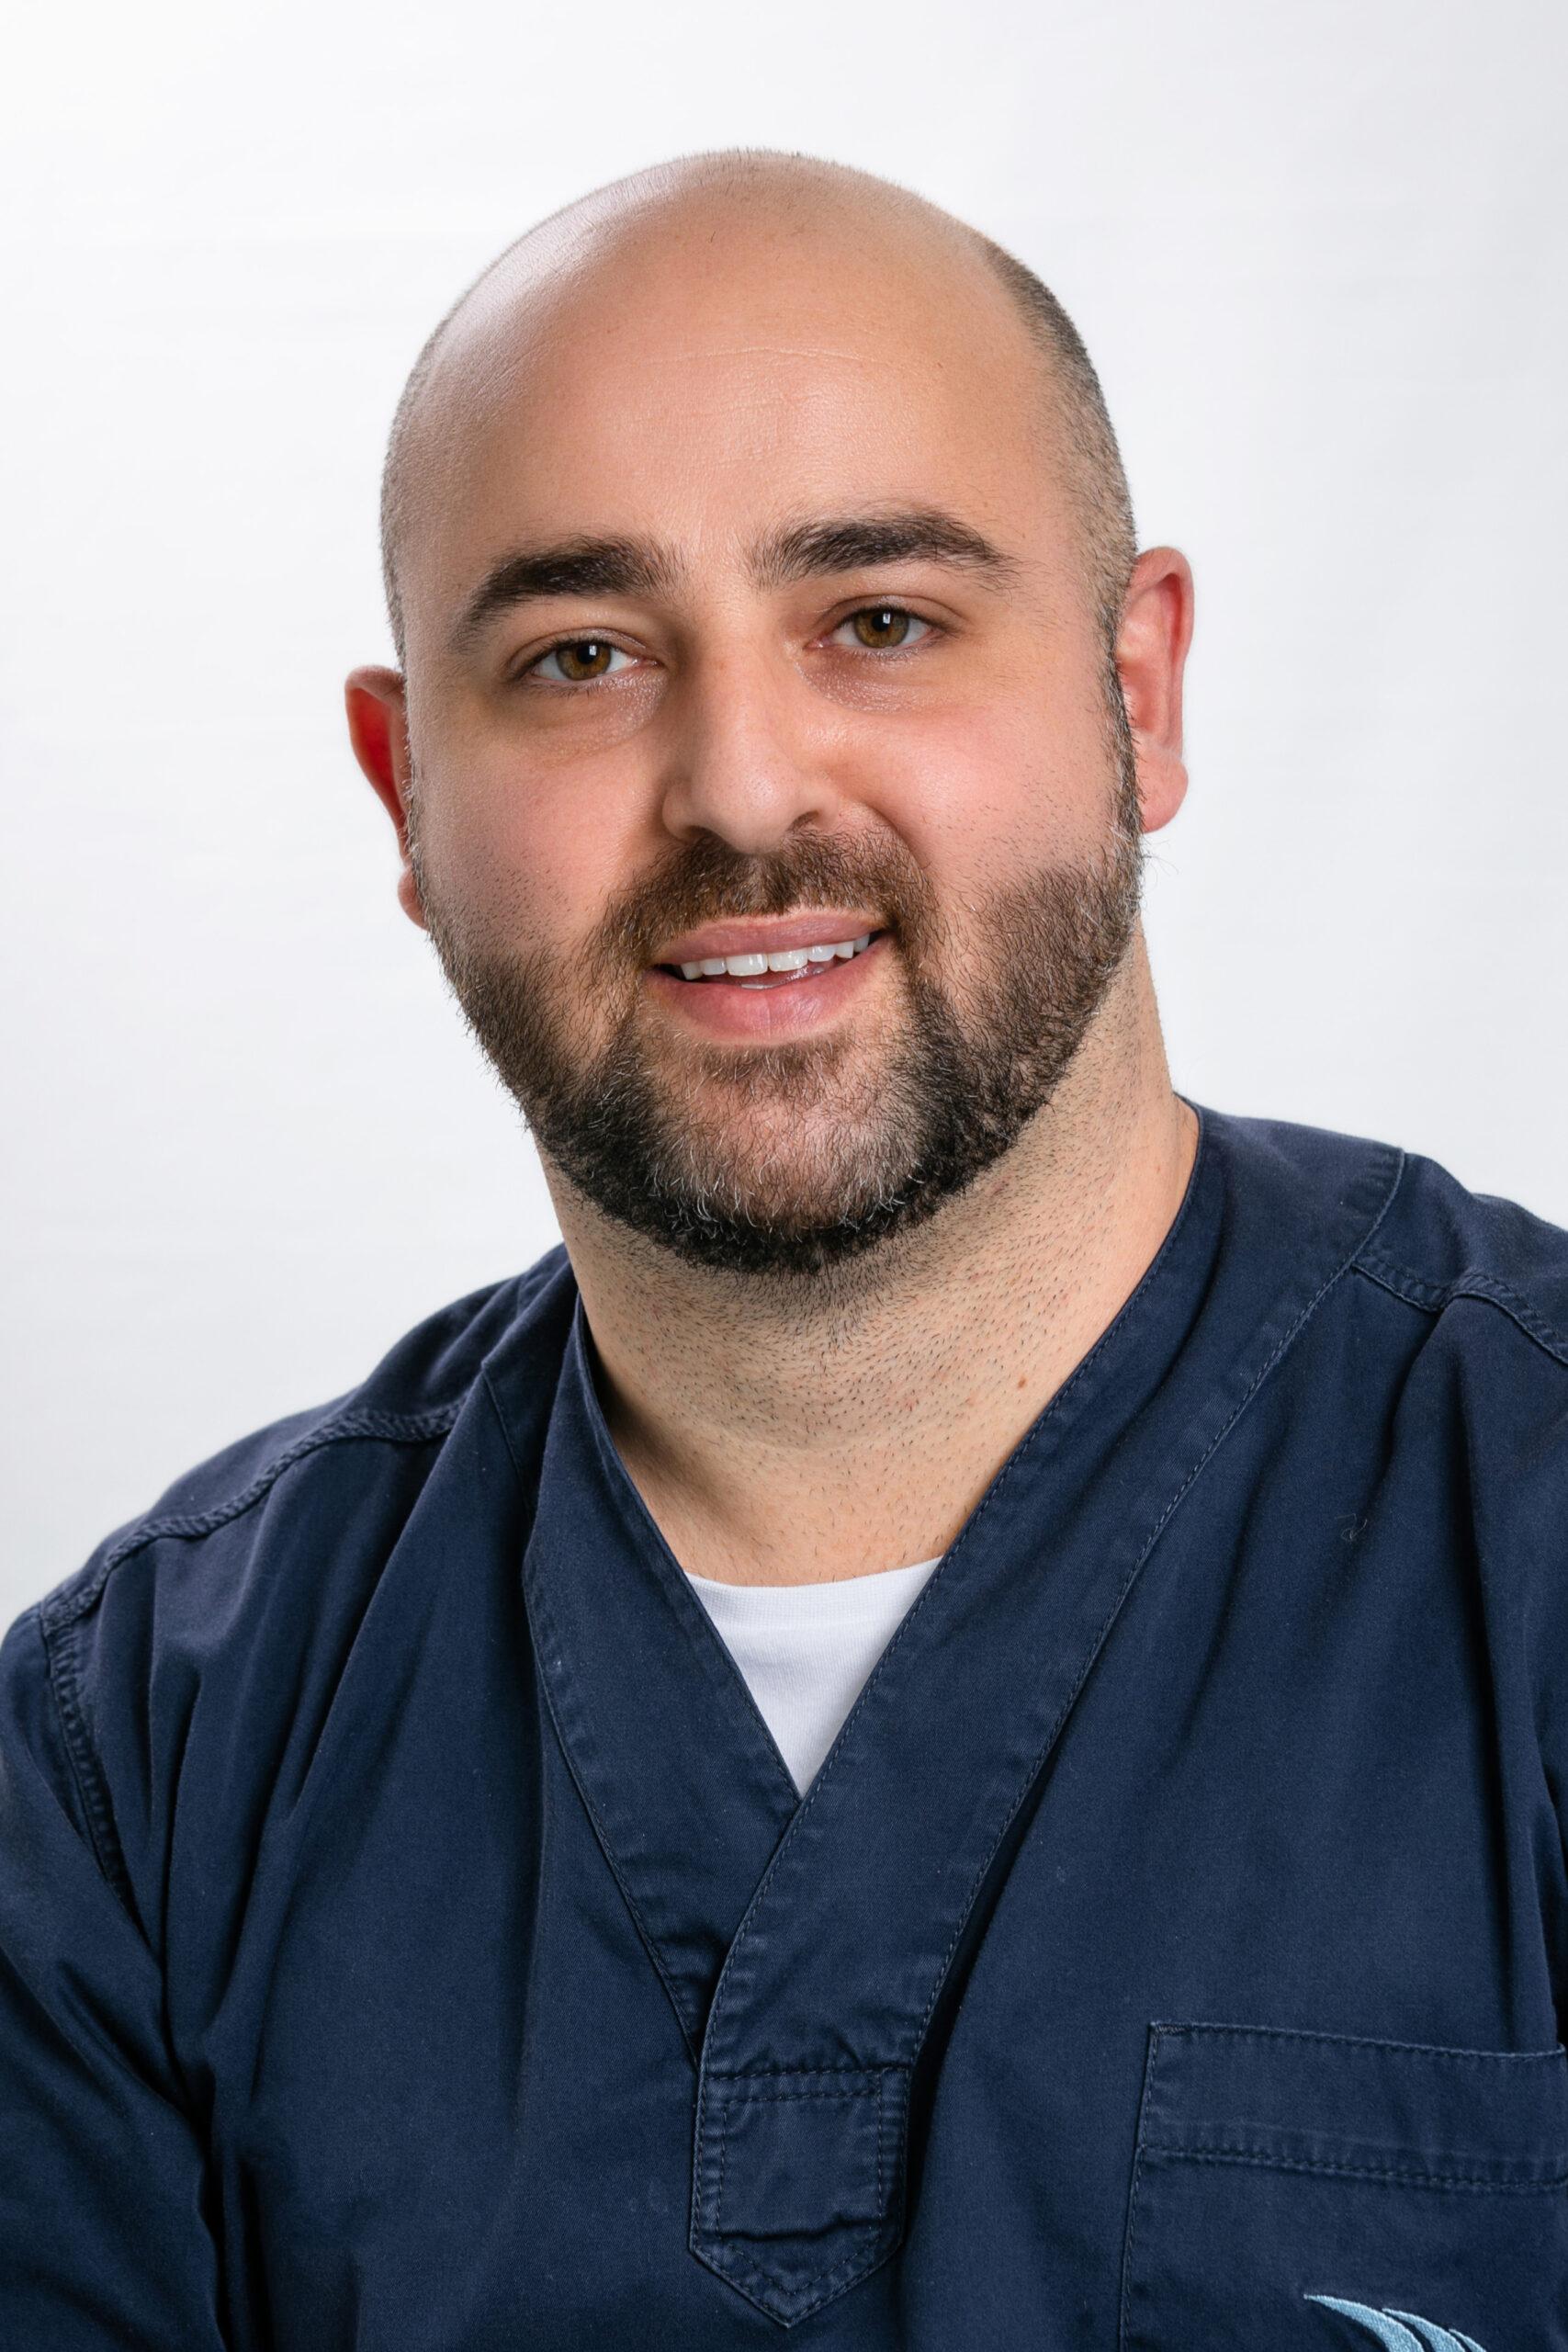 Dott. Tommaso Pelizzoni